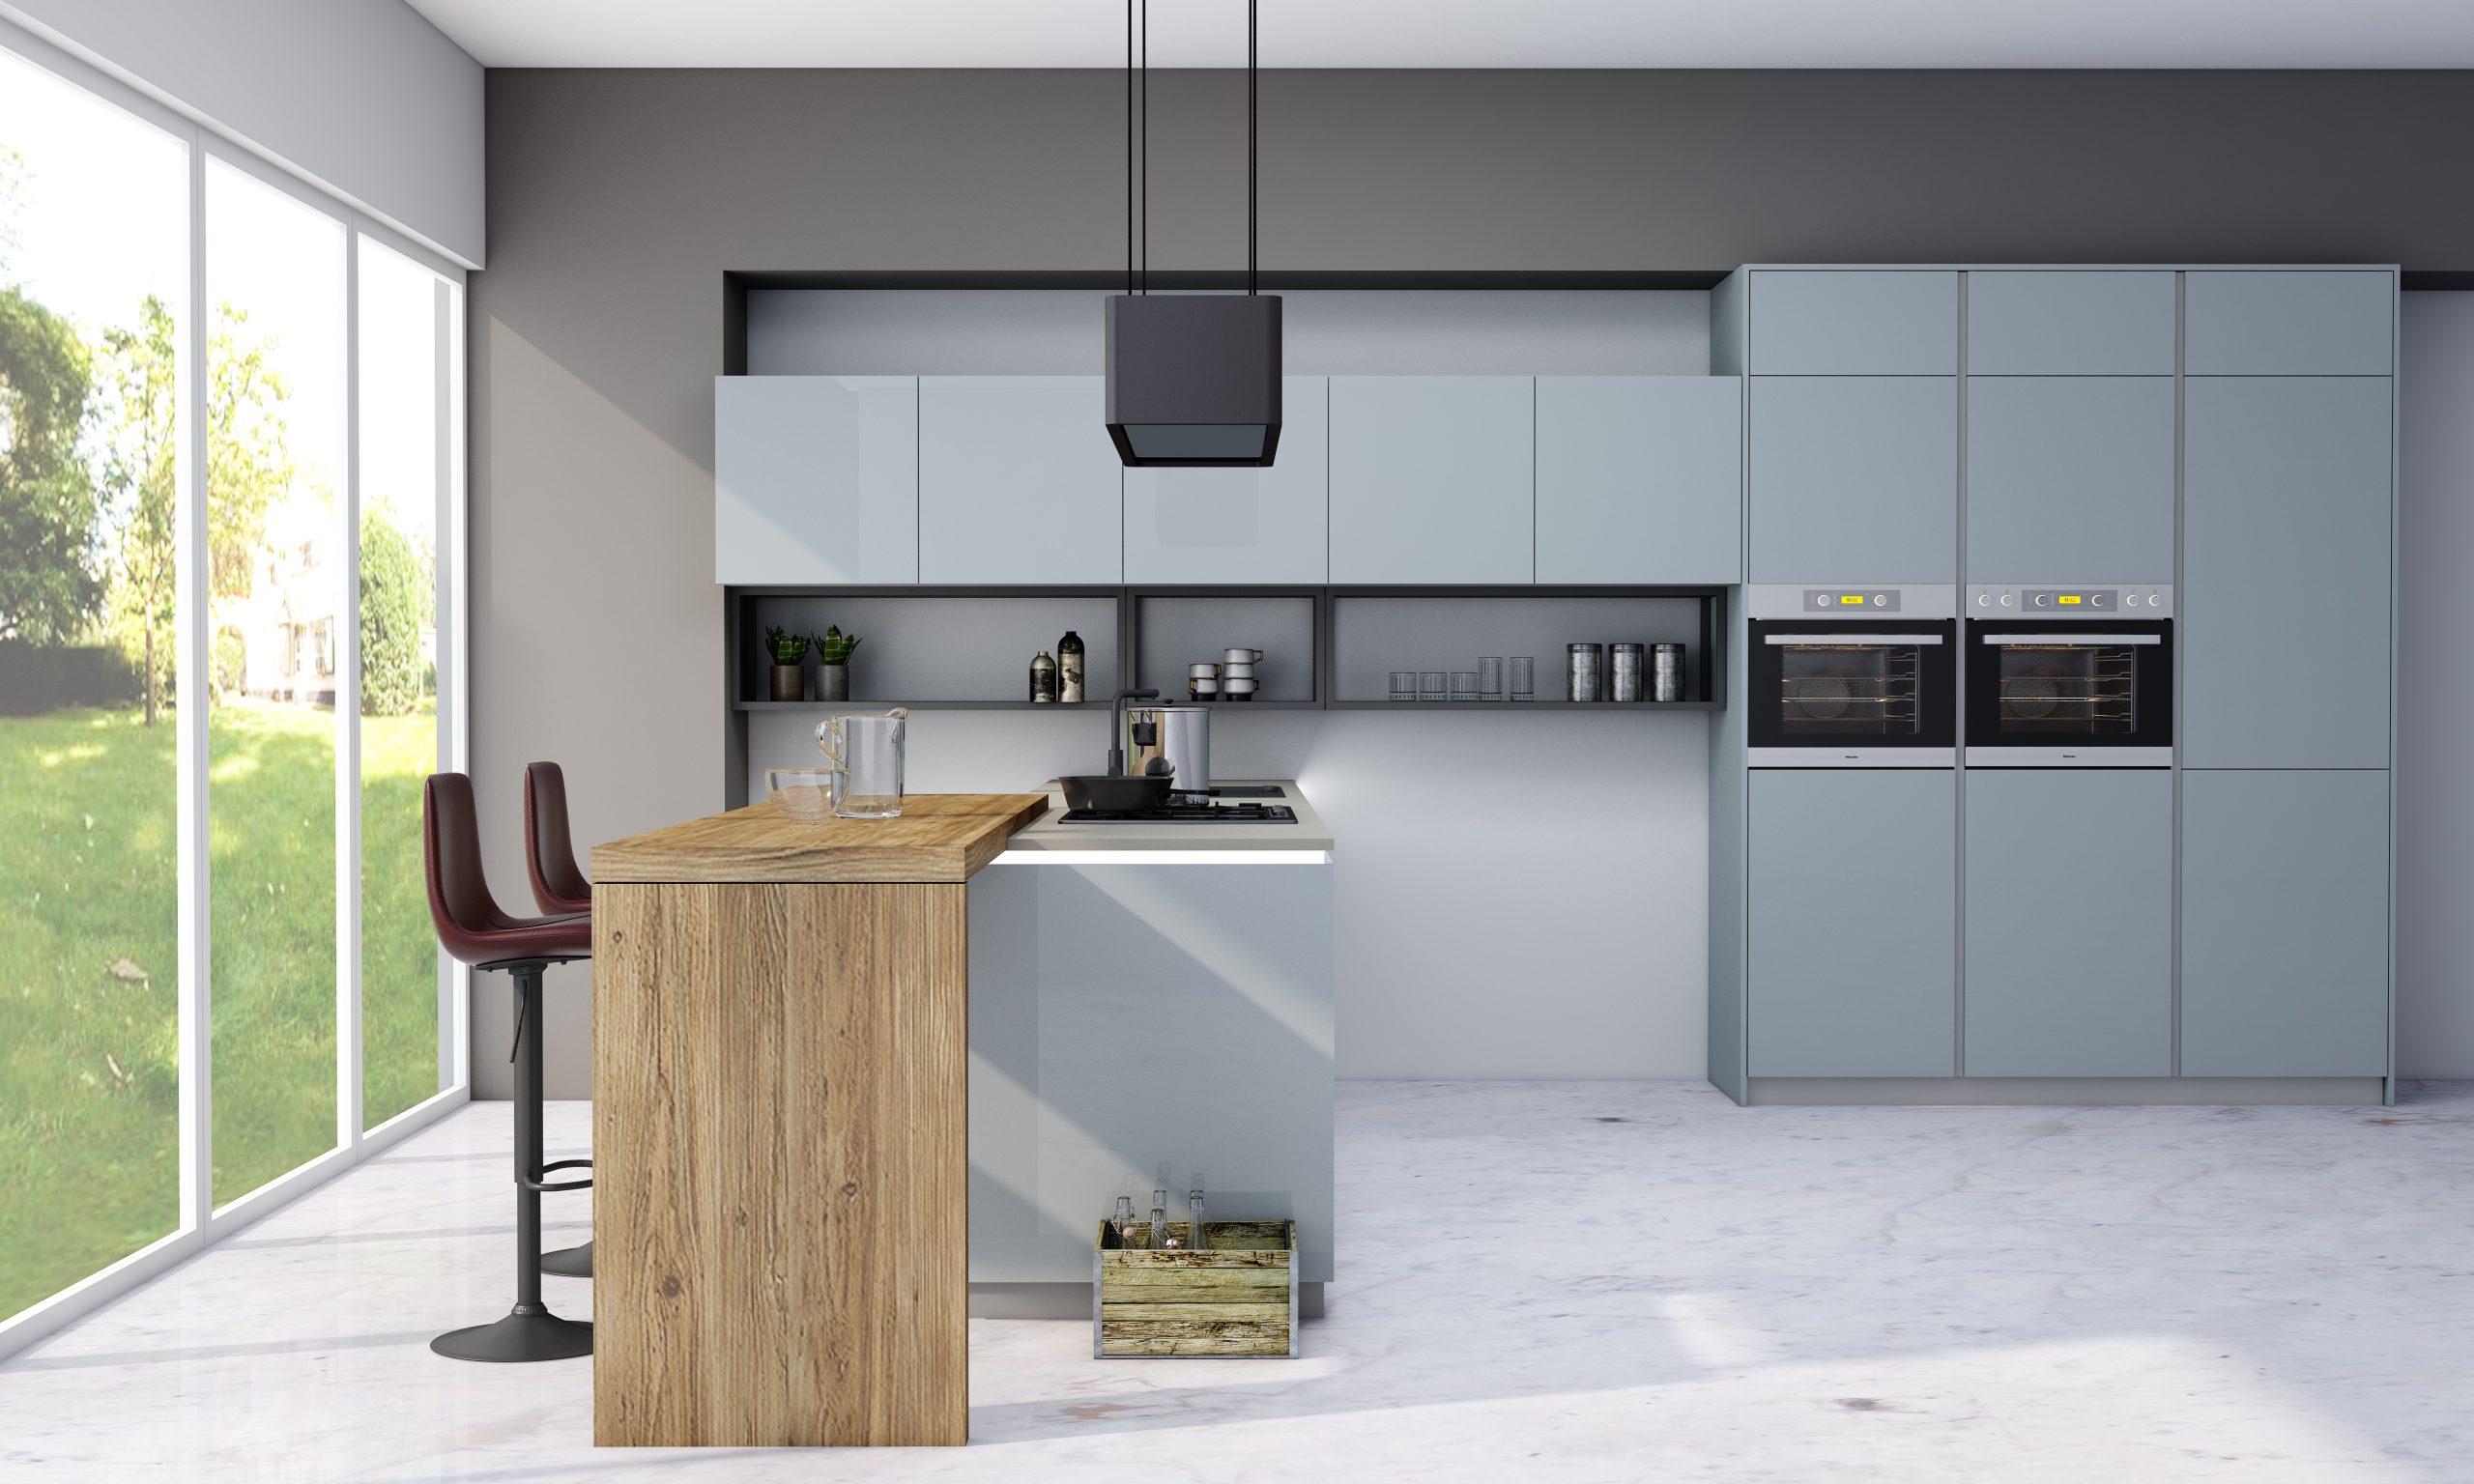 Premiumline kitchen in aluminium handleless profile with dining area finish Metallic blue gloss acrylic (2)